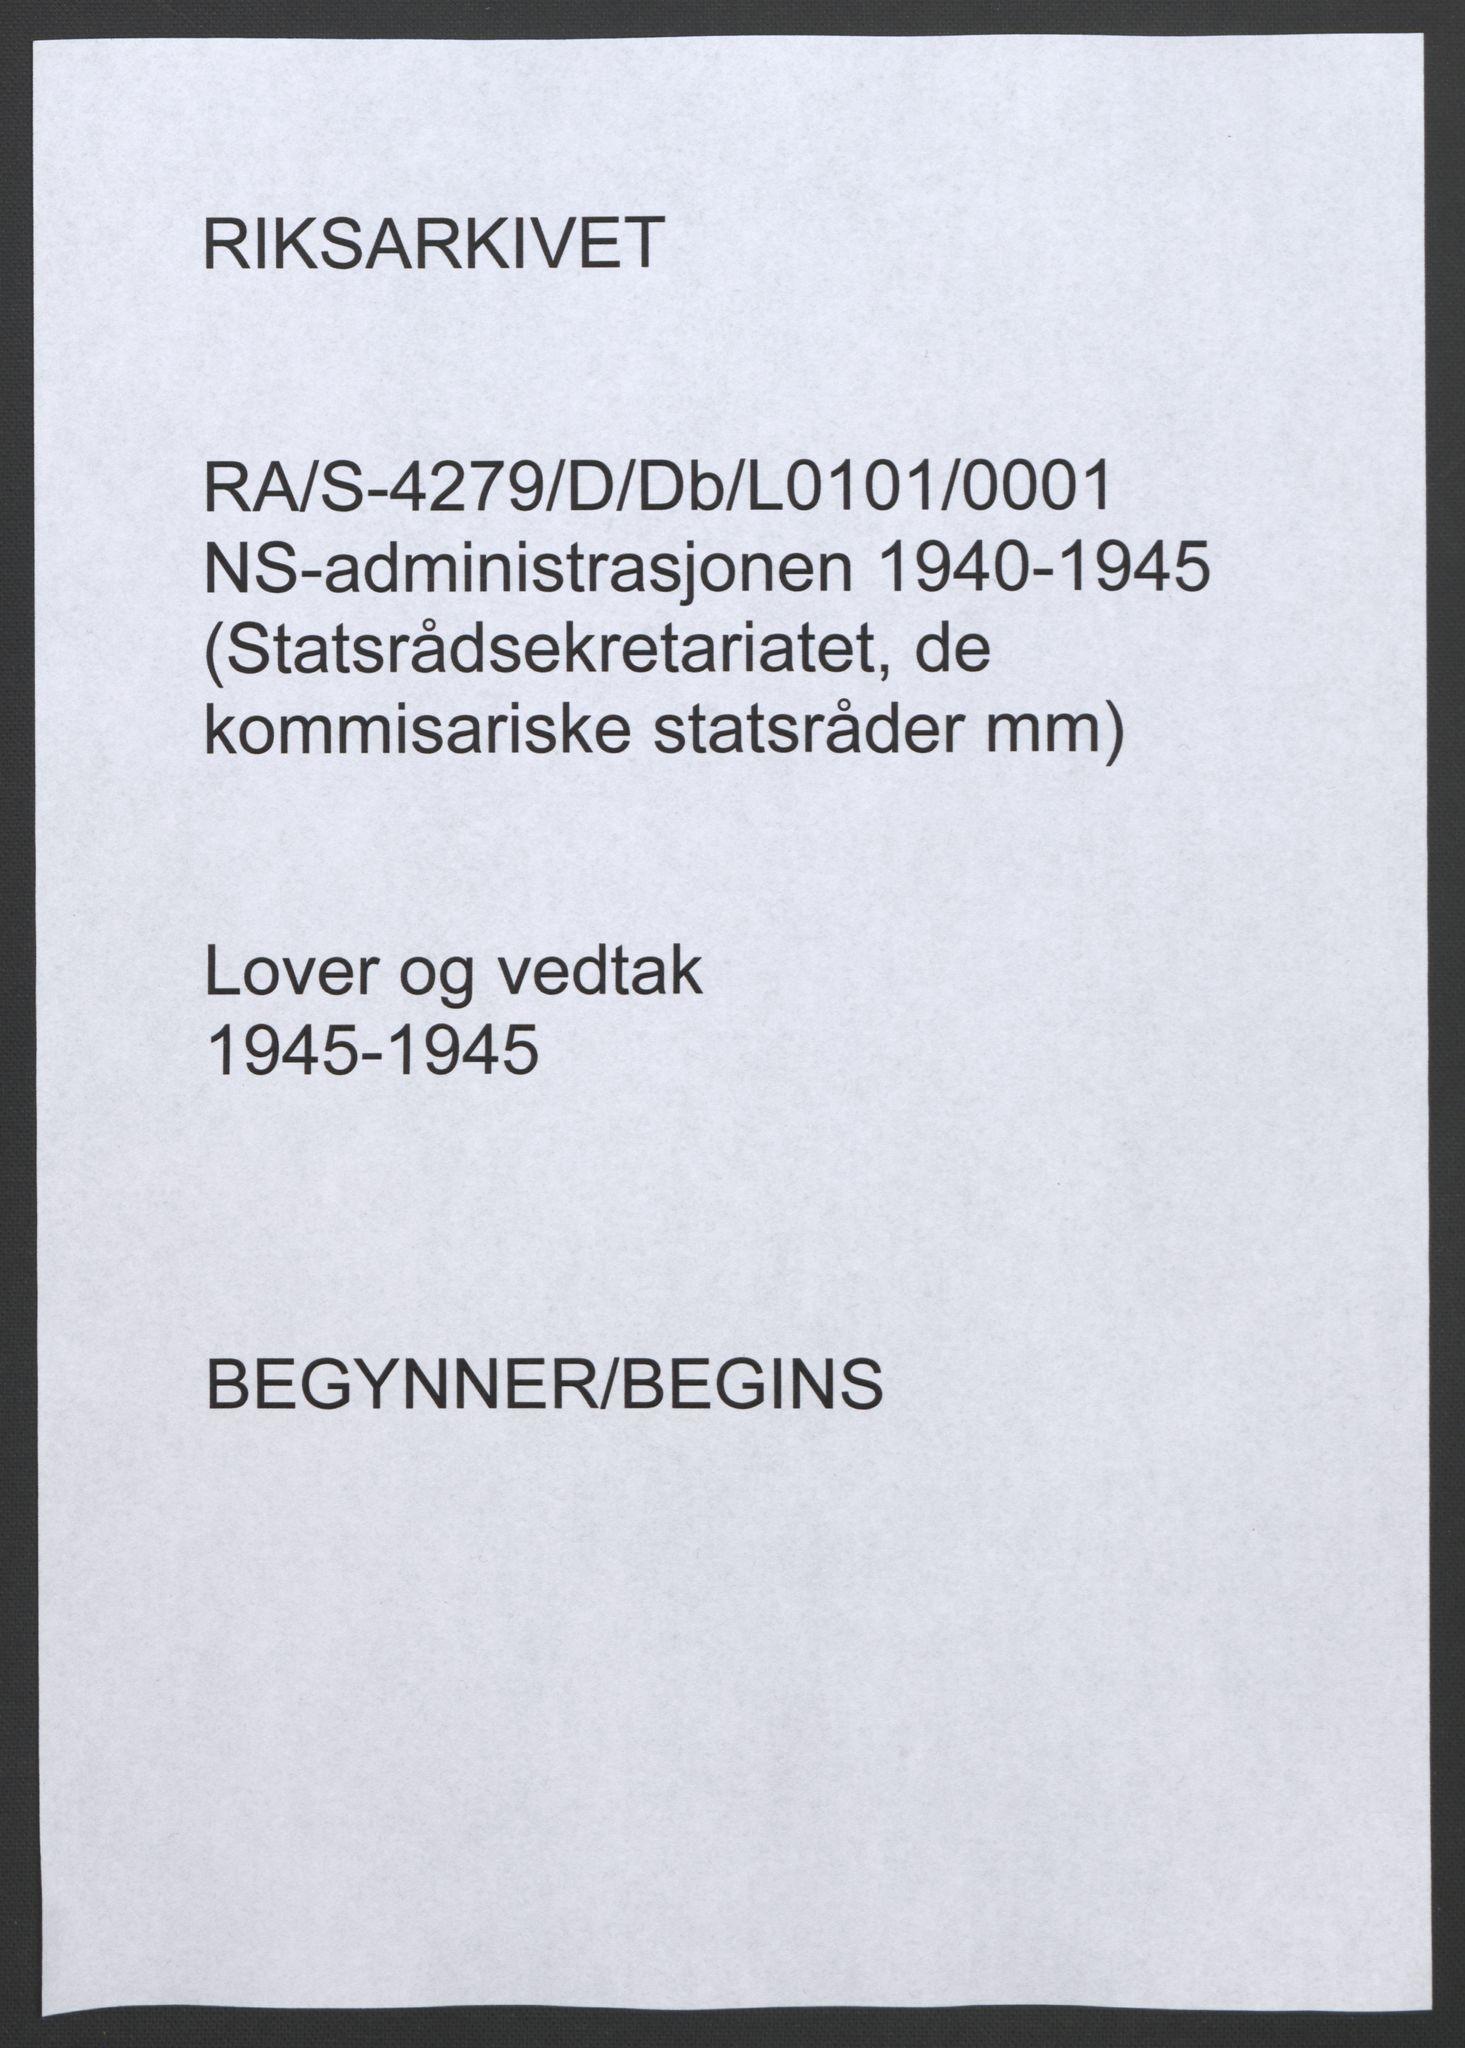 RA, NS-administrasjonen 1940-1945 (Statsrådsekretariatet, de kommisariske statsråder mm), D/Db/L0101, 1945, s. upaginert